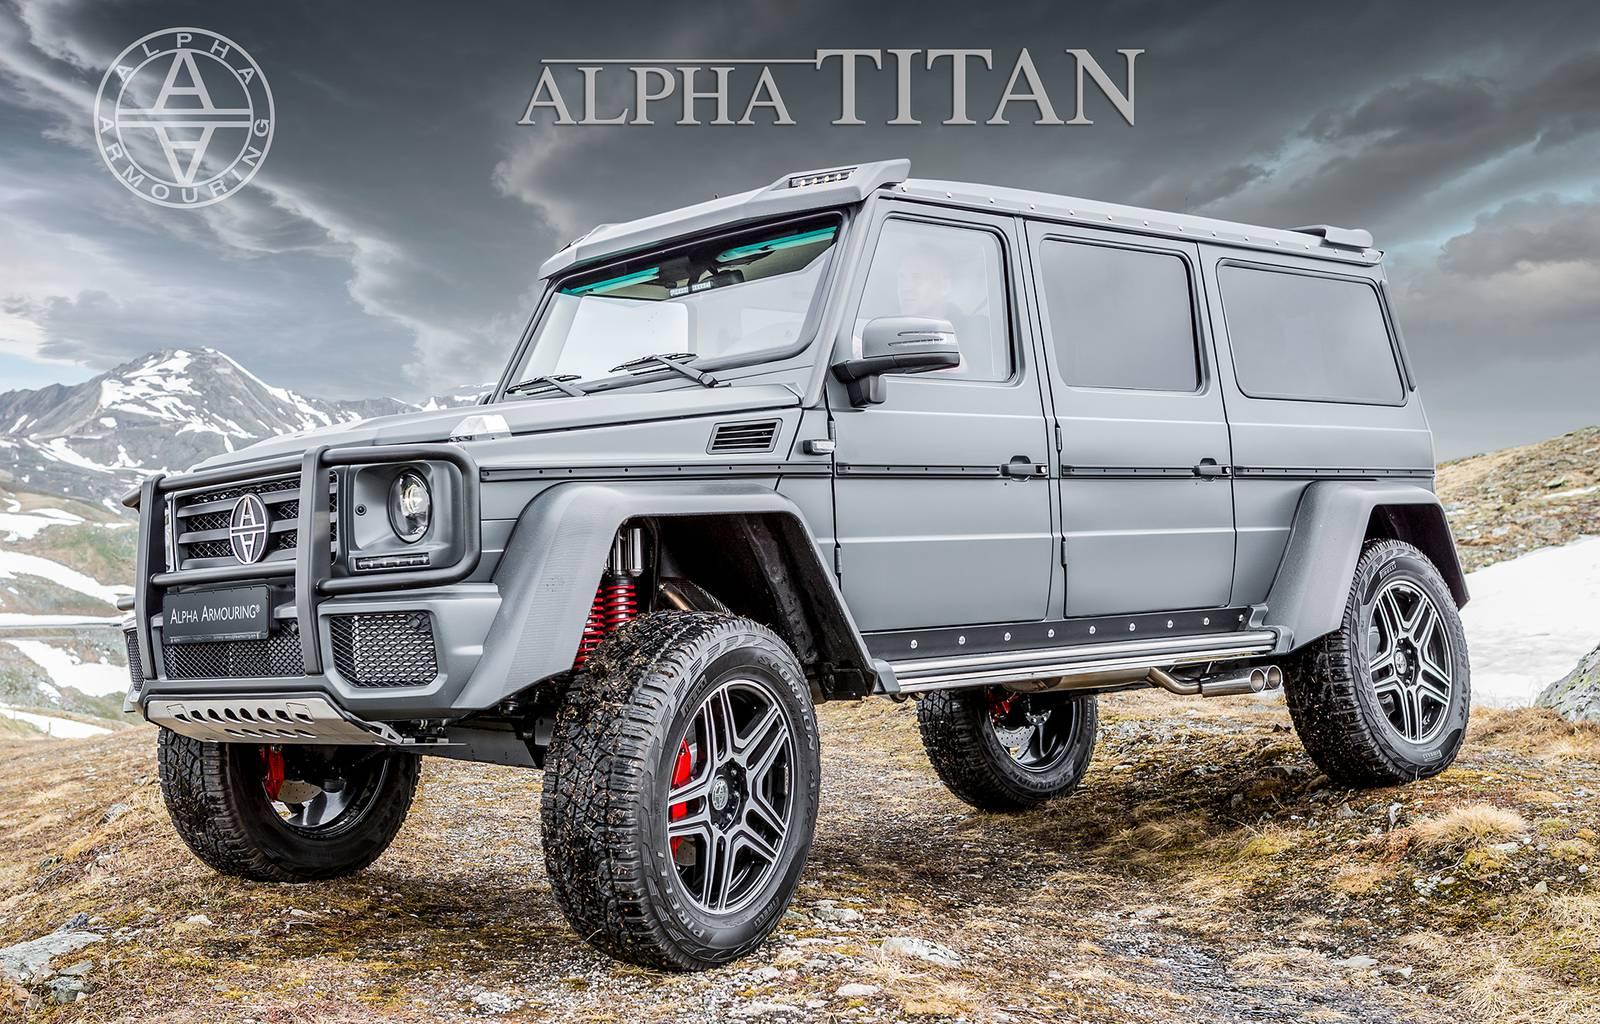 Titan alpha Every Titan